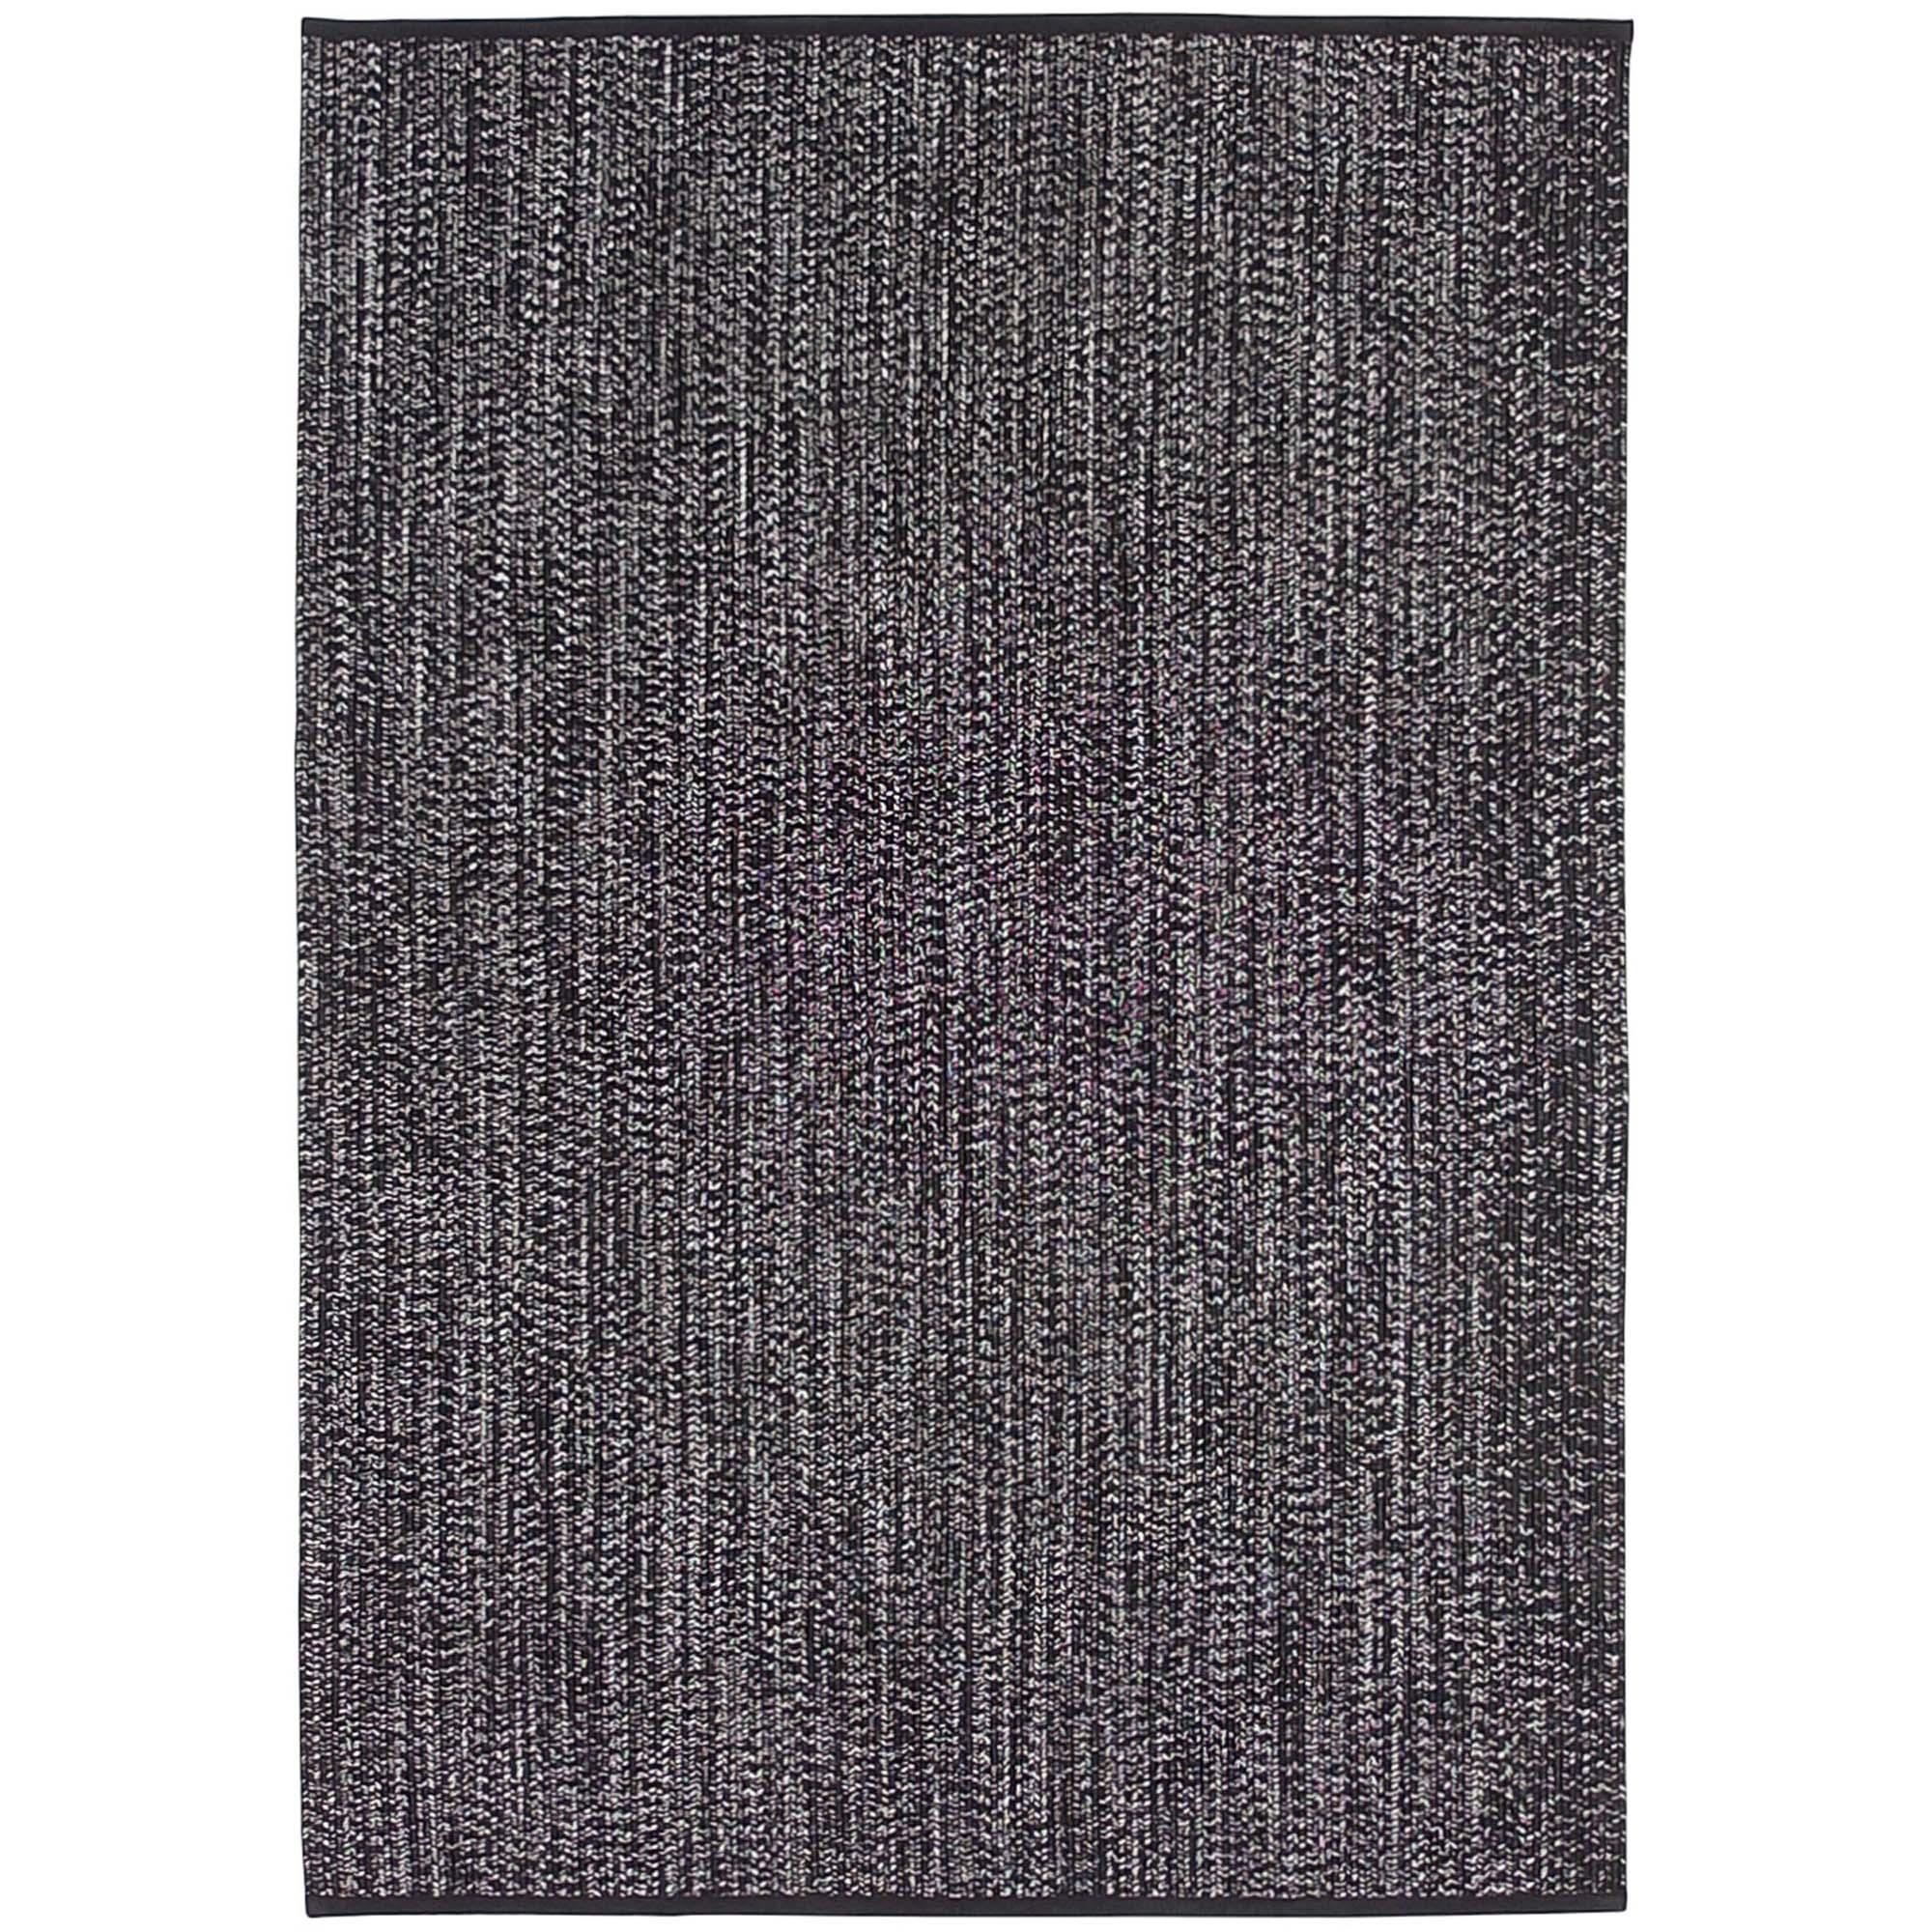 SEASSC1_Seasons_Stripe_charcoal_160x230-full